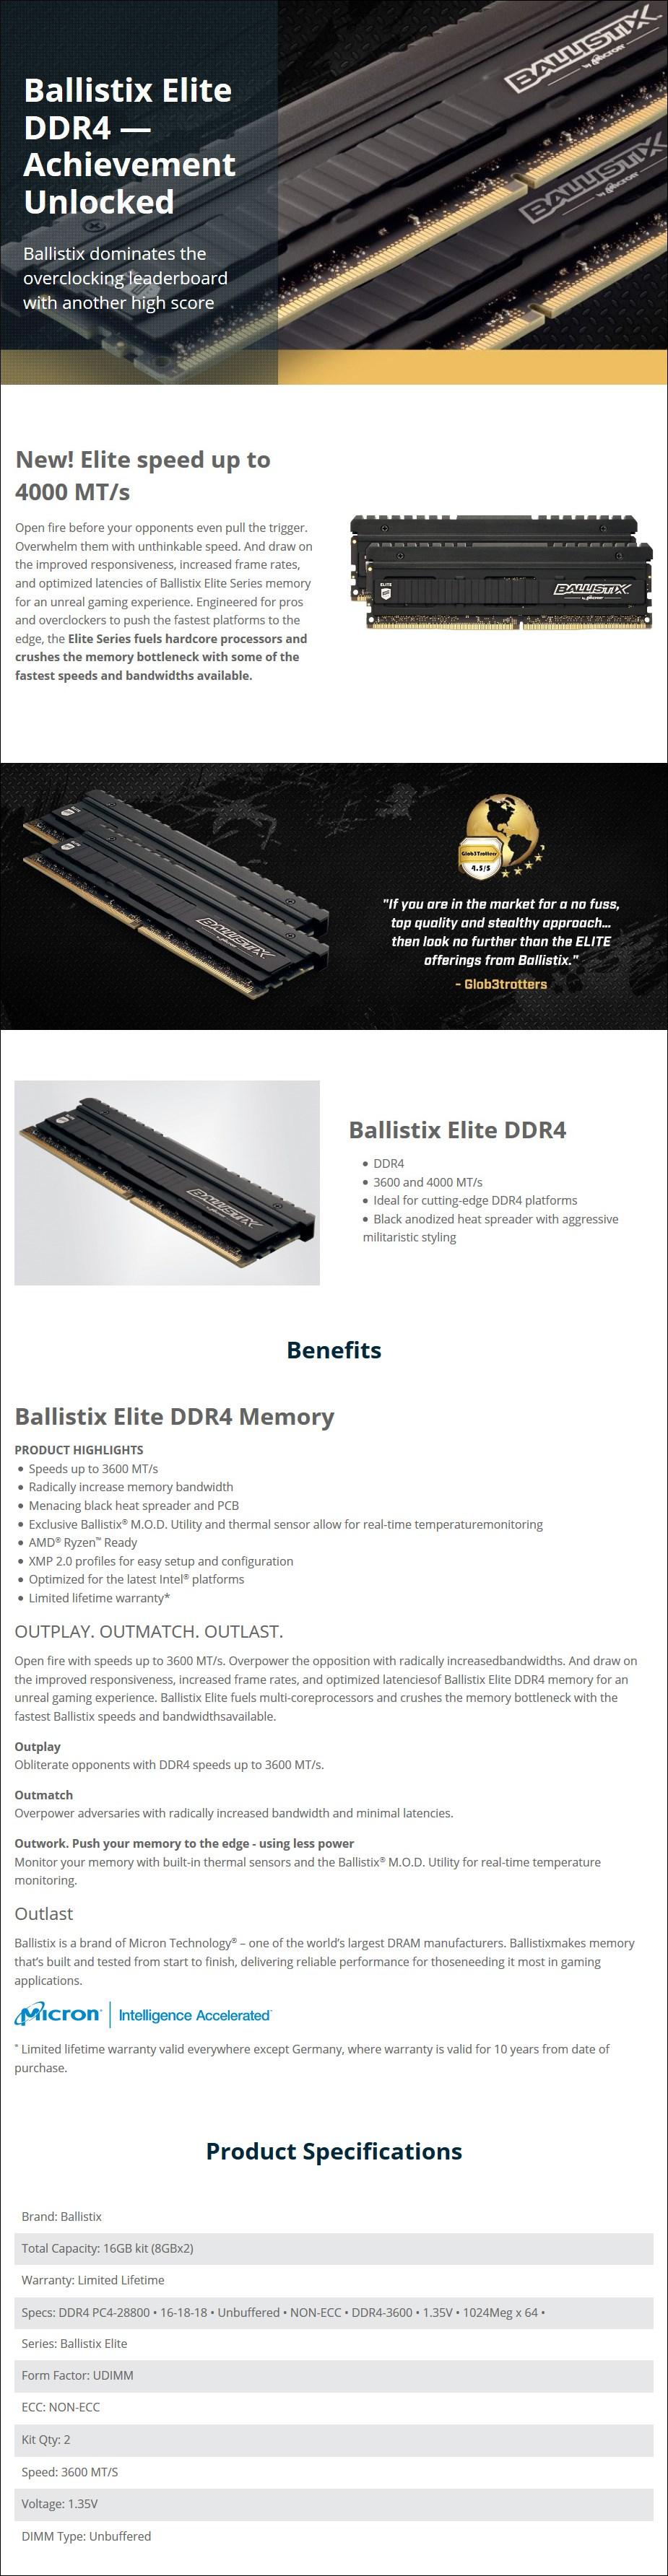 Crucial Ballistix Elite 16GB (2x 8GB) DDR4 3600MHz Memory - Overview 1